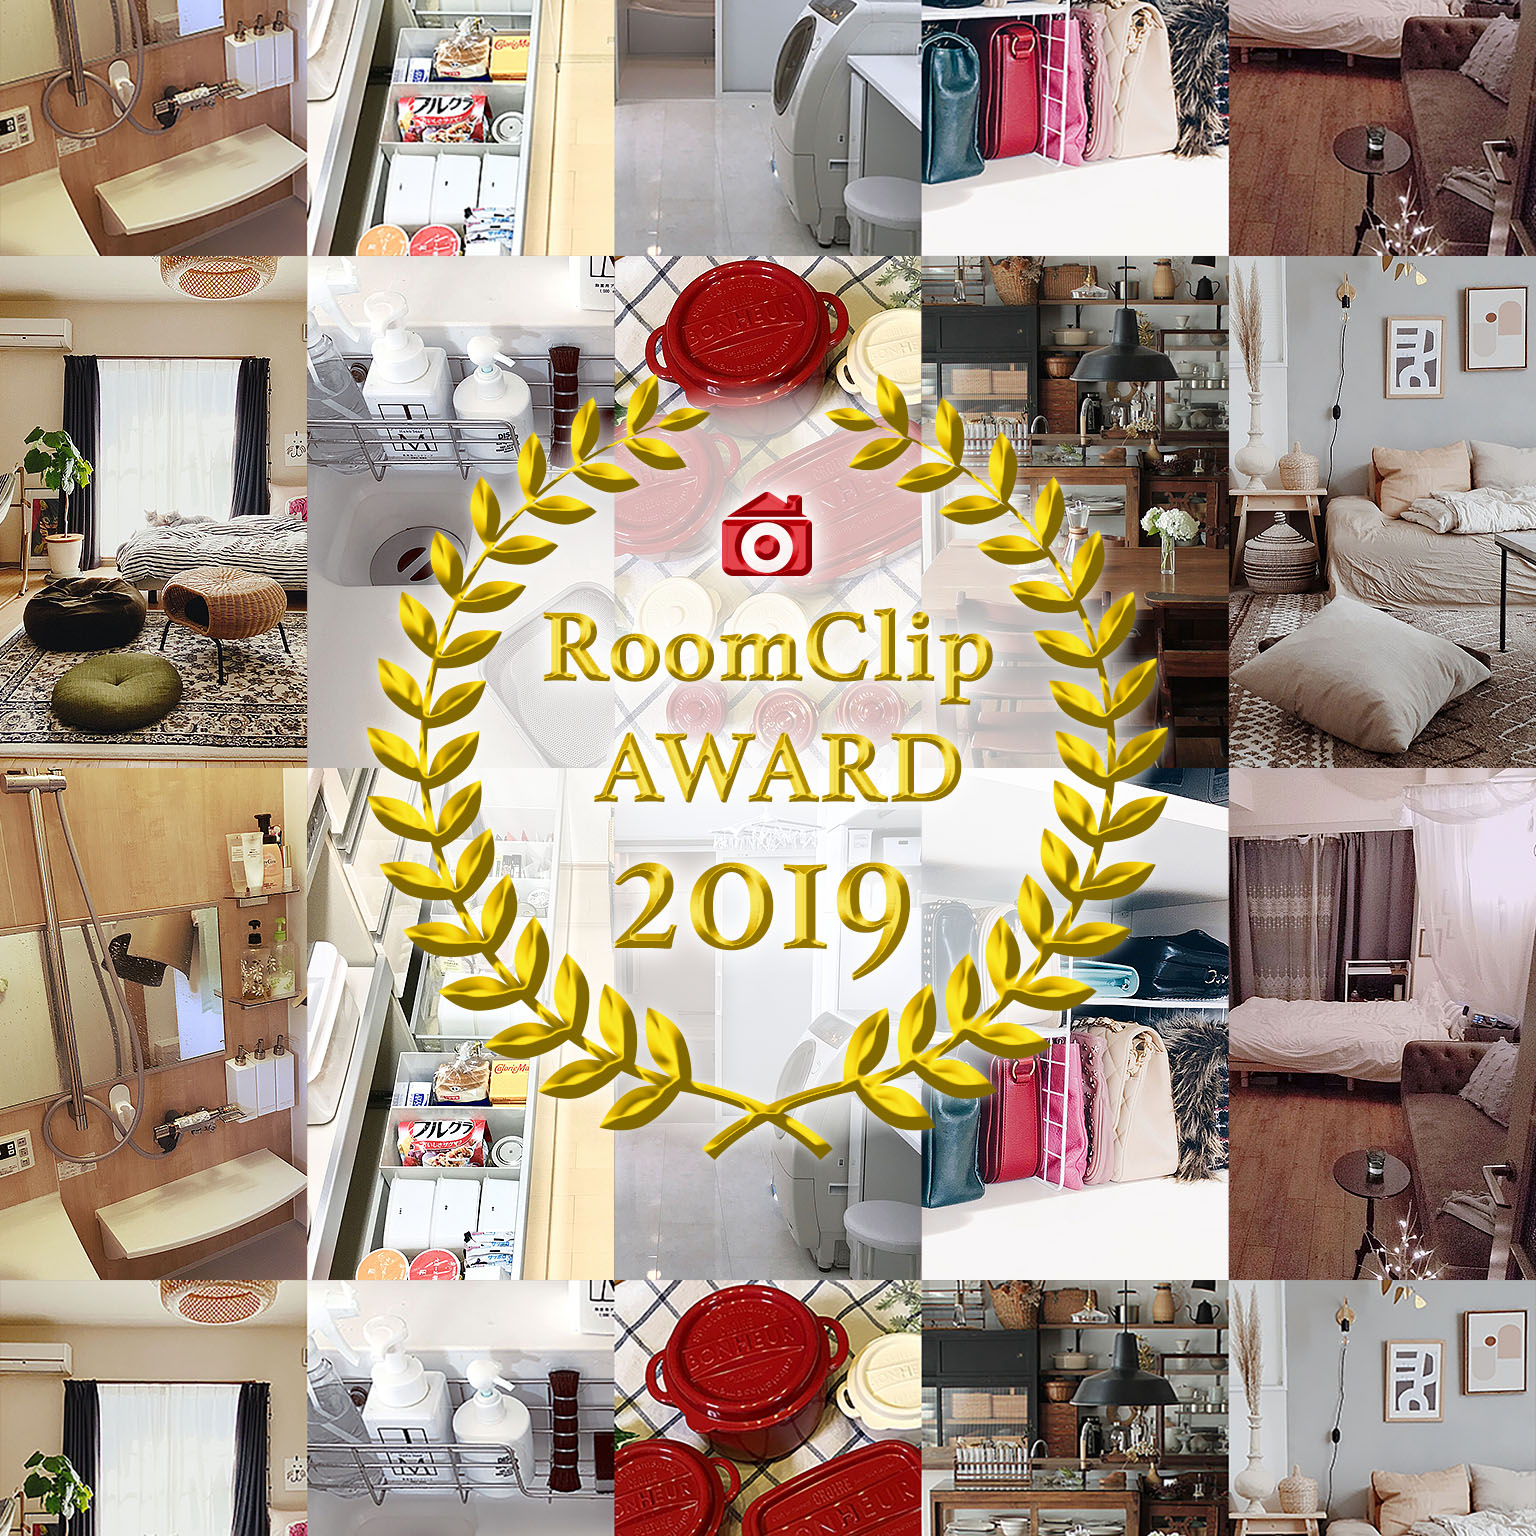 RoomClip Award 2019☆今年のインテリアトレンドを大発表!